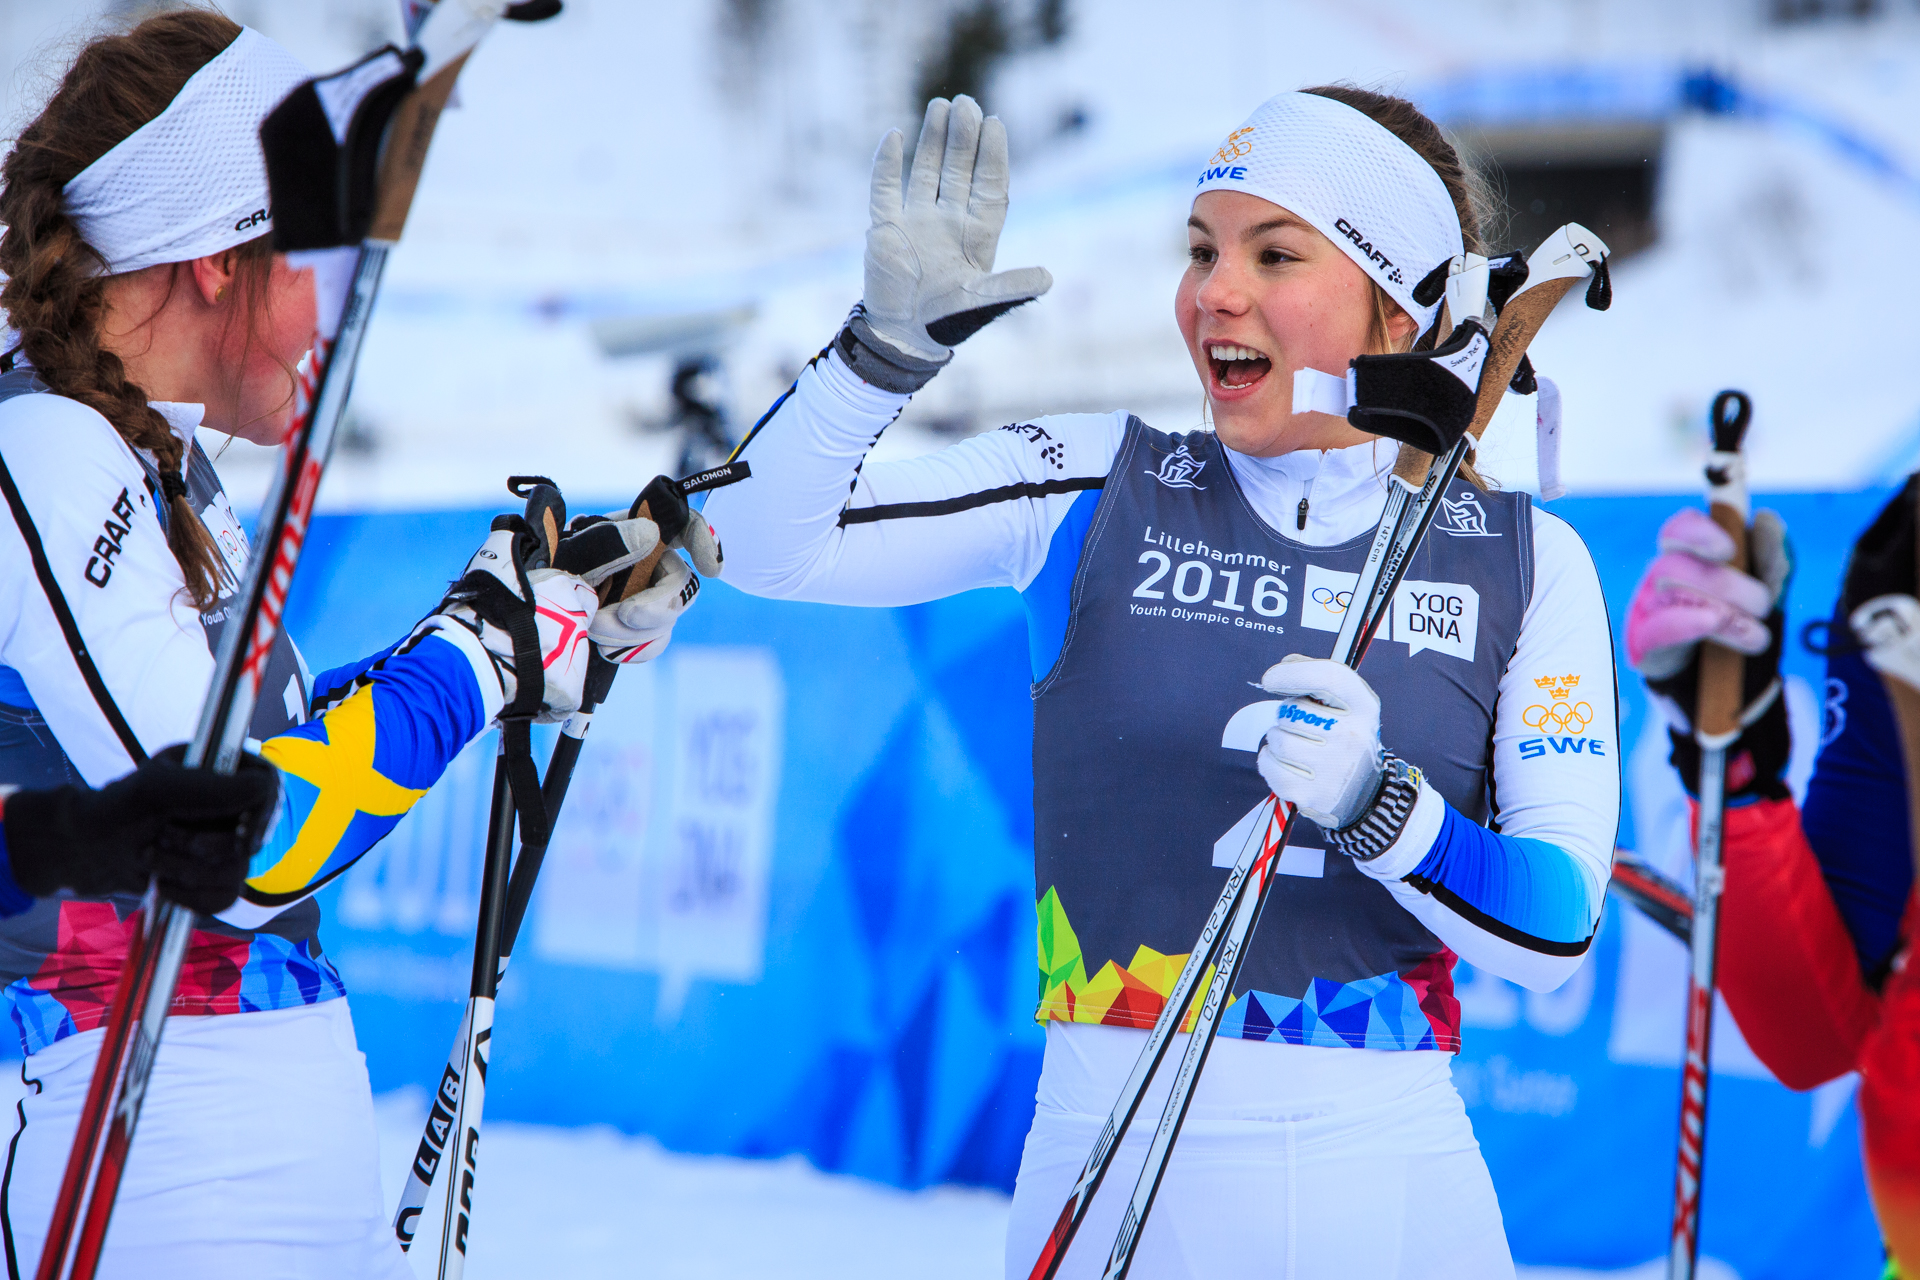 Lillehammer 2016 - Caroline Strømhylden2.jpg